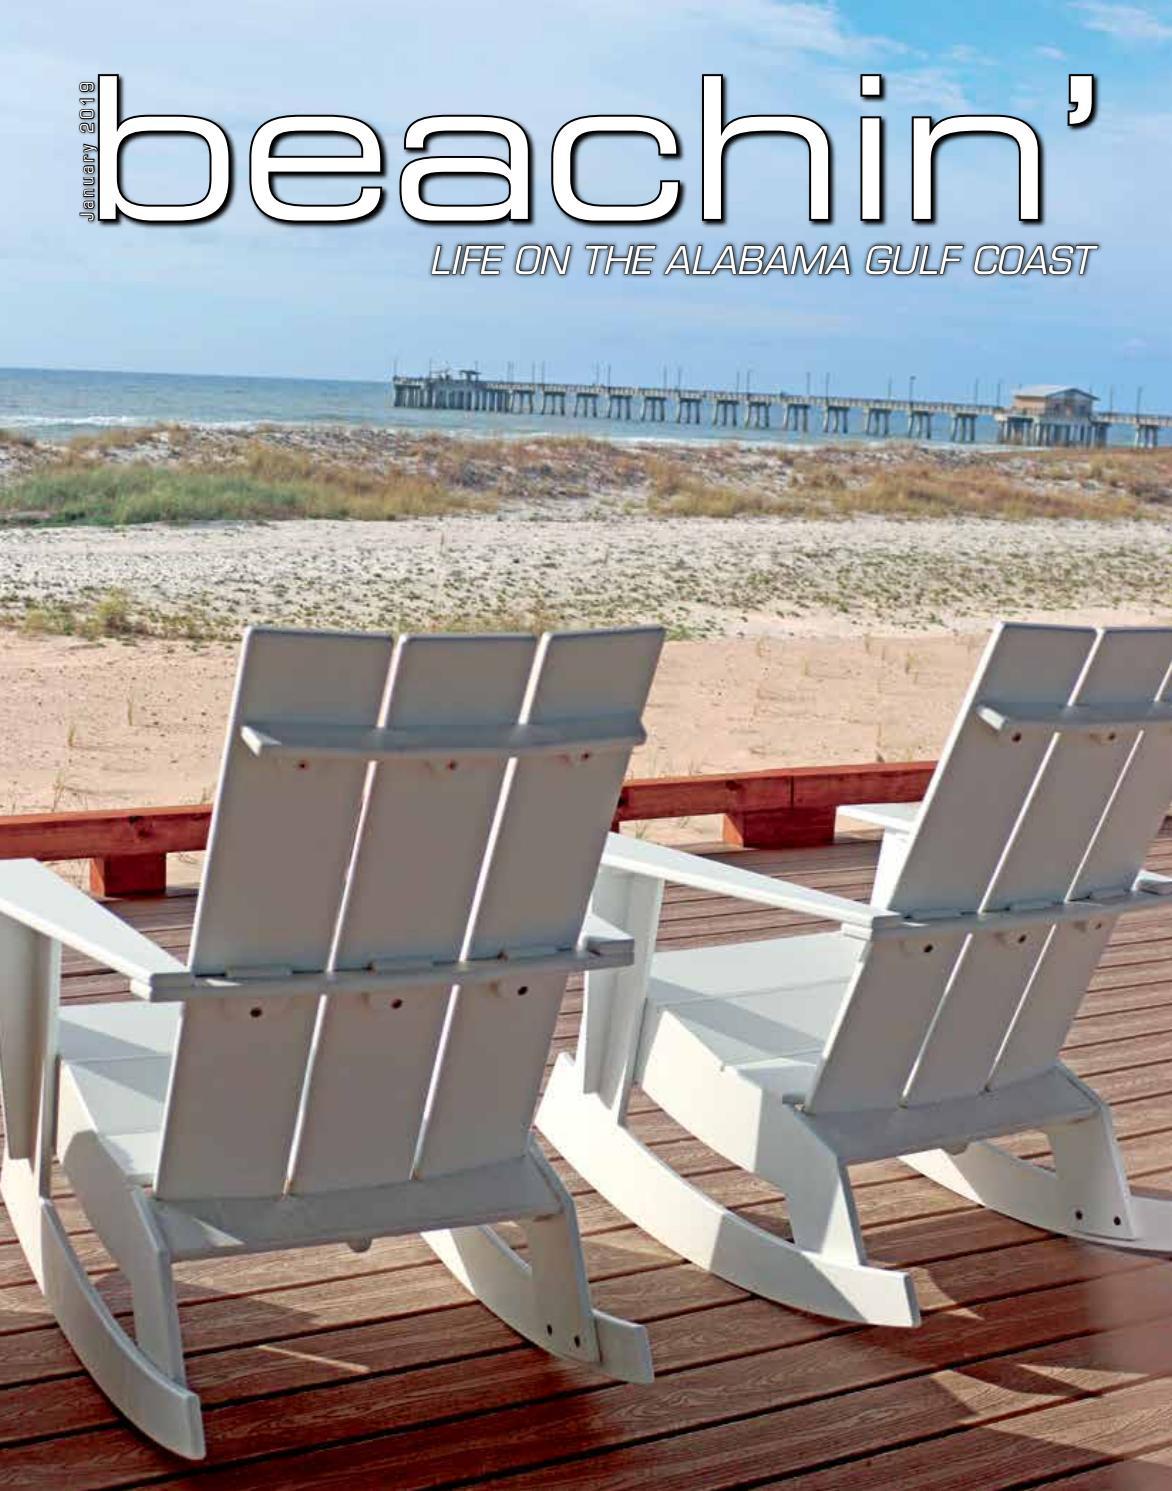 Beachin (Jan. 2019) By Gulf Coast Media